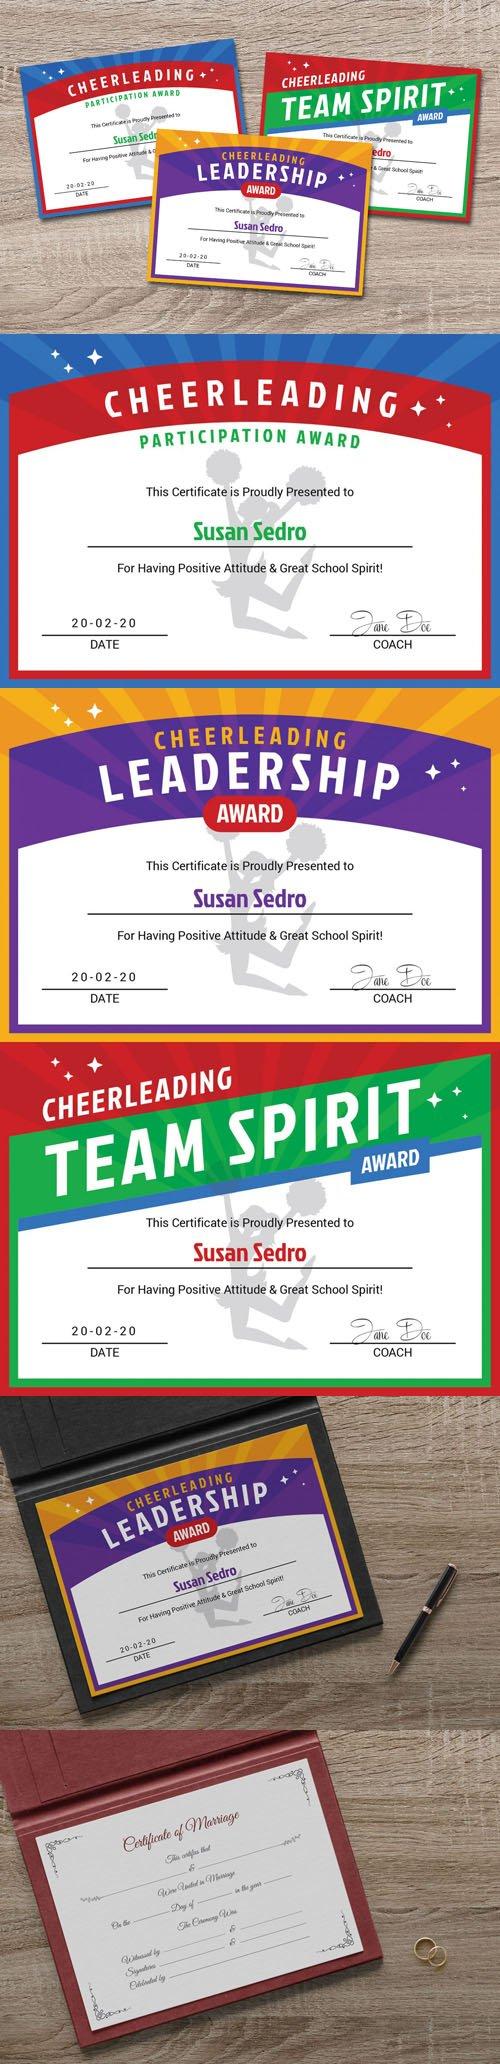 Cheerleader Award Certificate & Wedding Card Design Templates